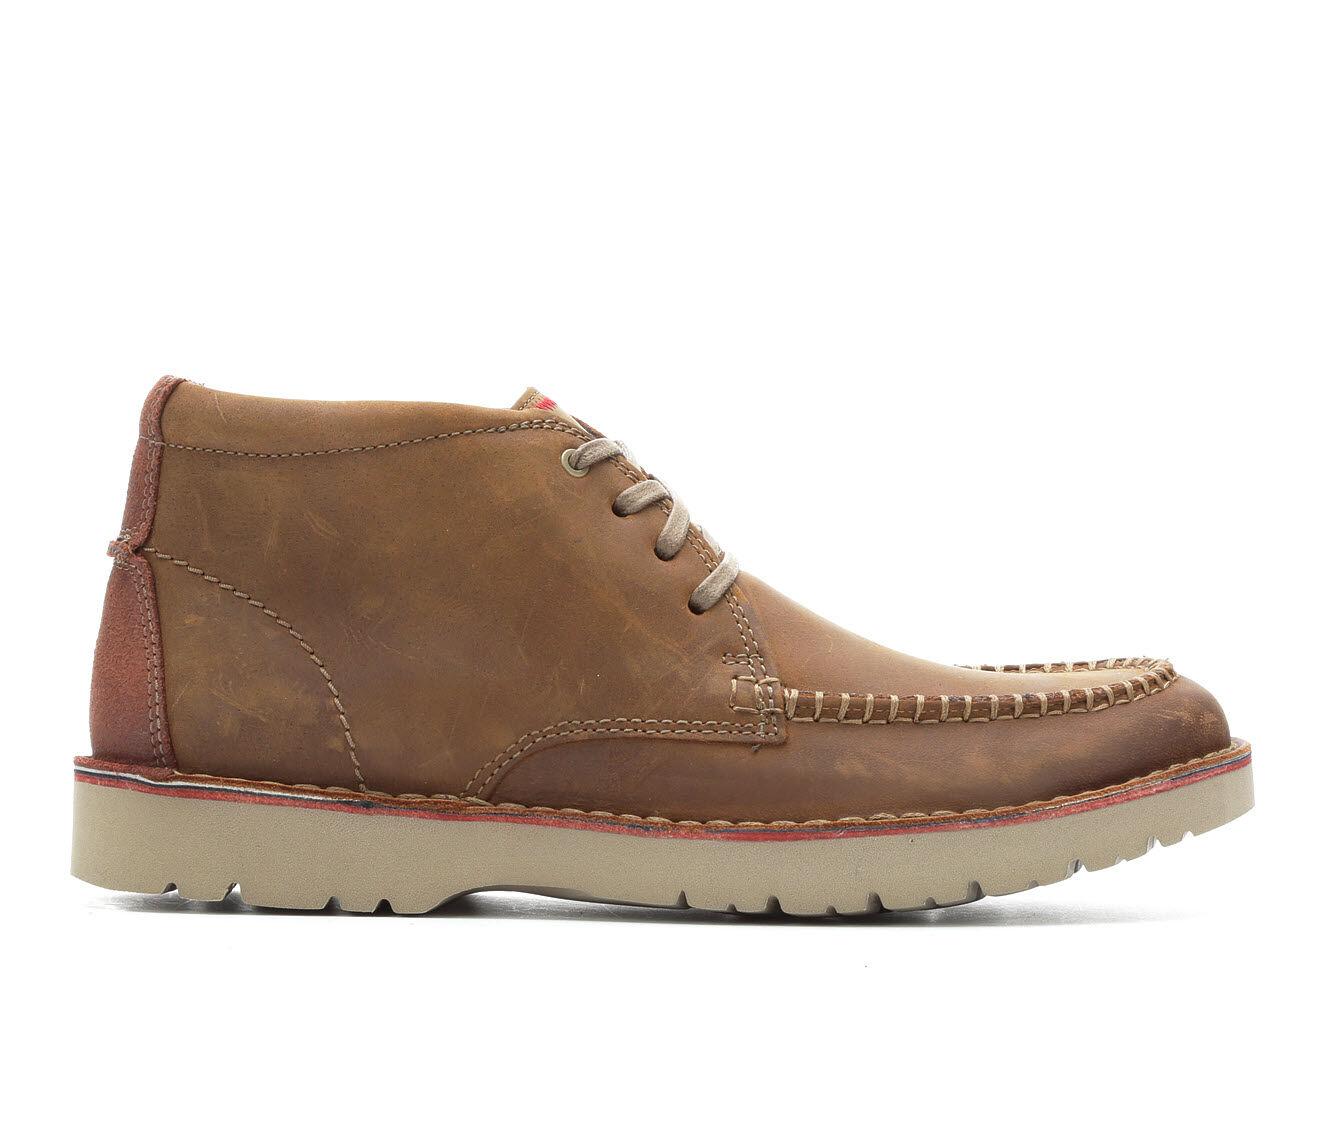 Men's Clarks Vargo Apron Boots